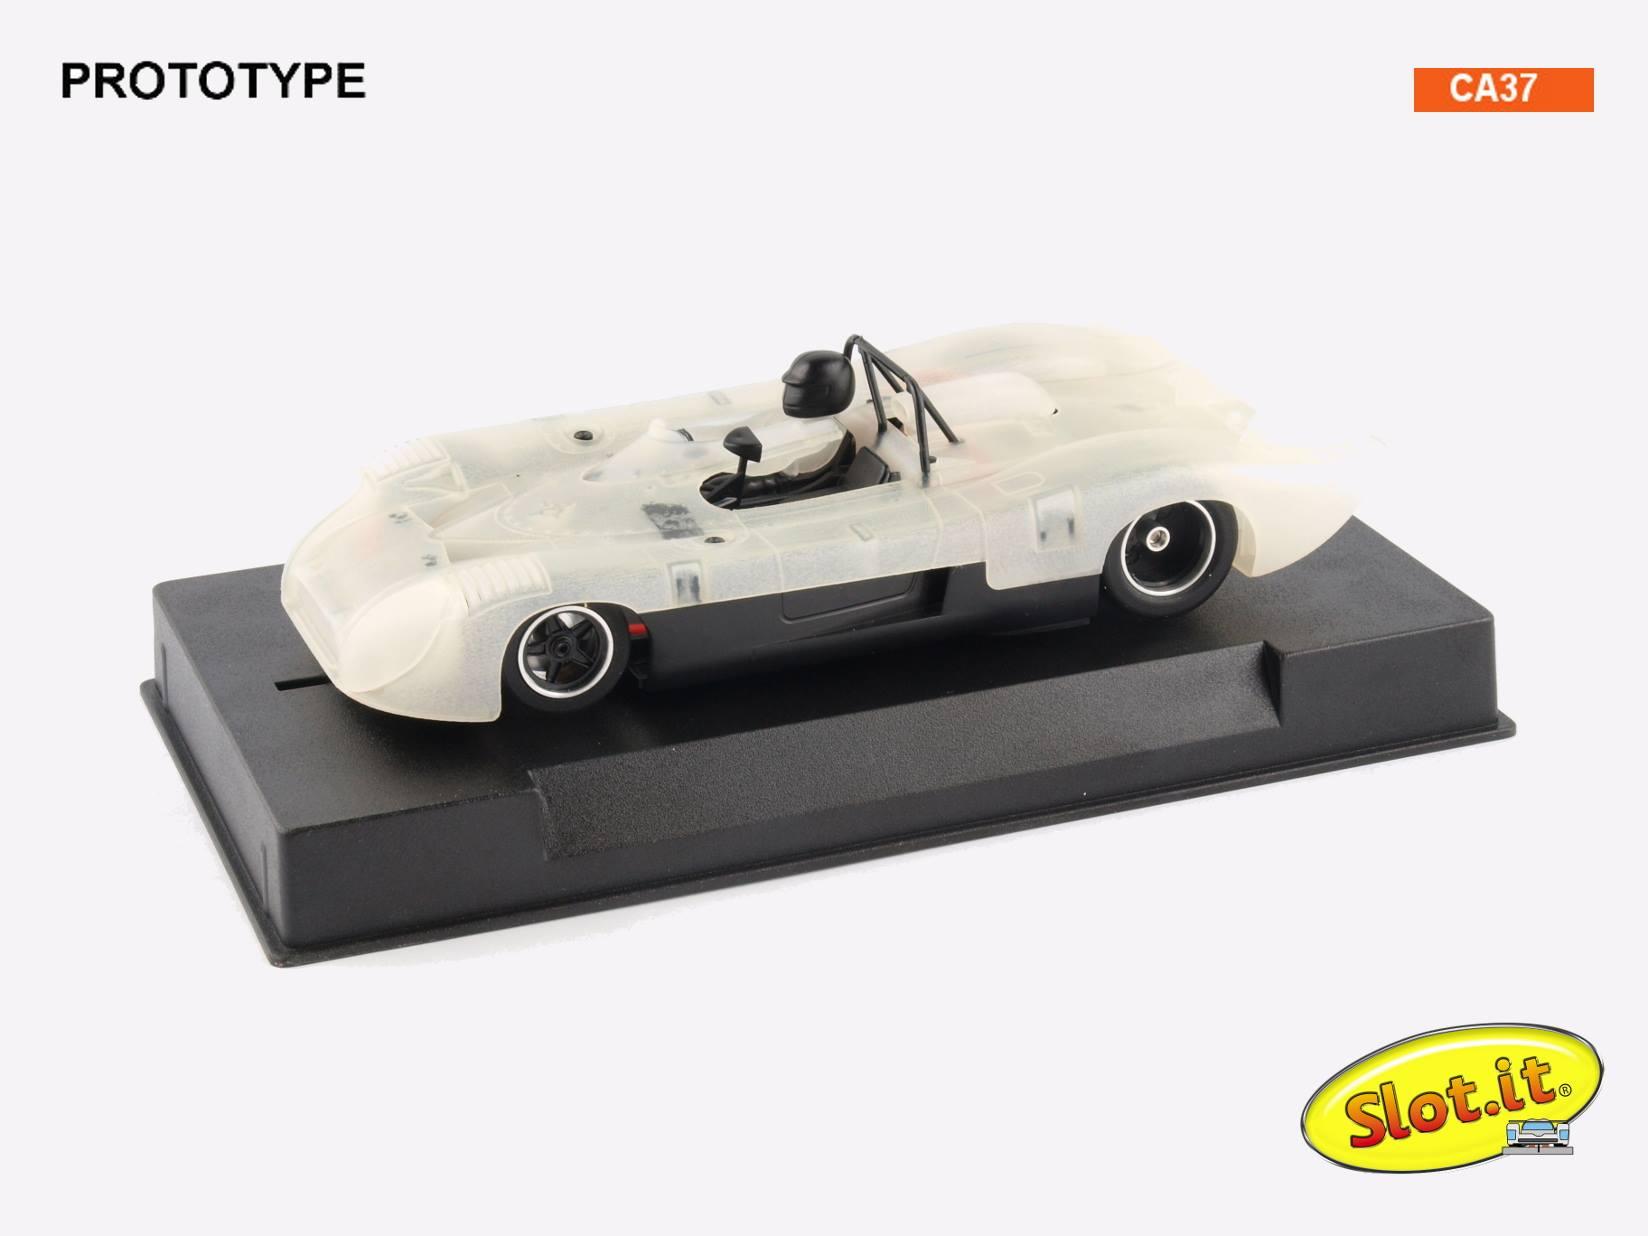 Matra 670B 1973 - 3D Prototype - CA37